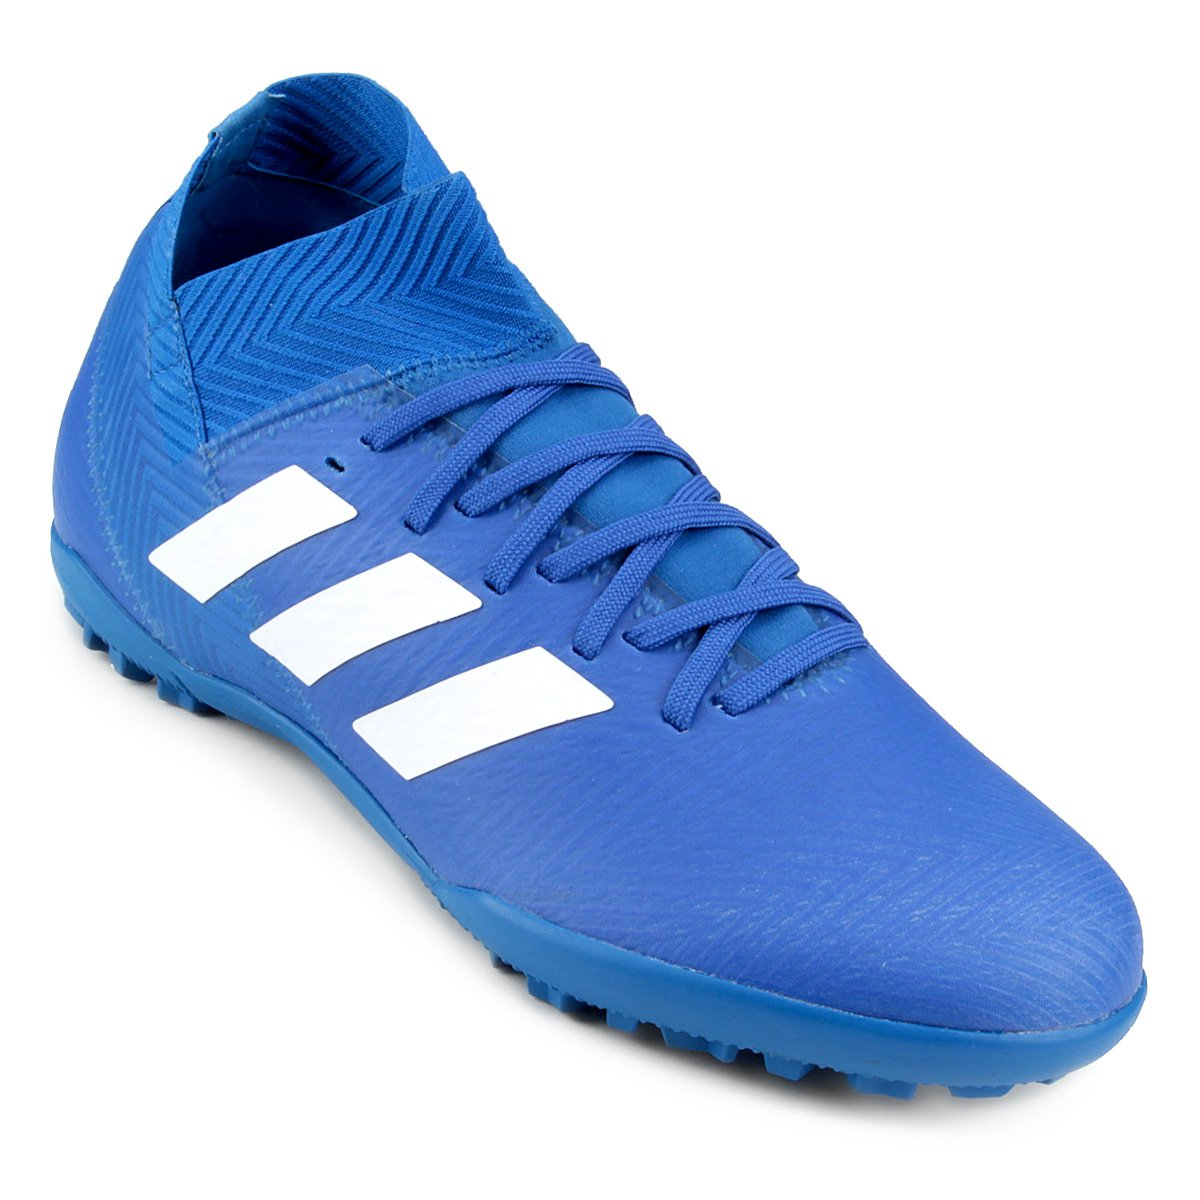 Masculina e TF Society Nemeziz Adidas Chuteira 18 Branco Azul 3 Tango  xAqB0znF ... e47c792ca8396